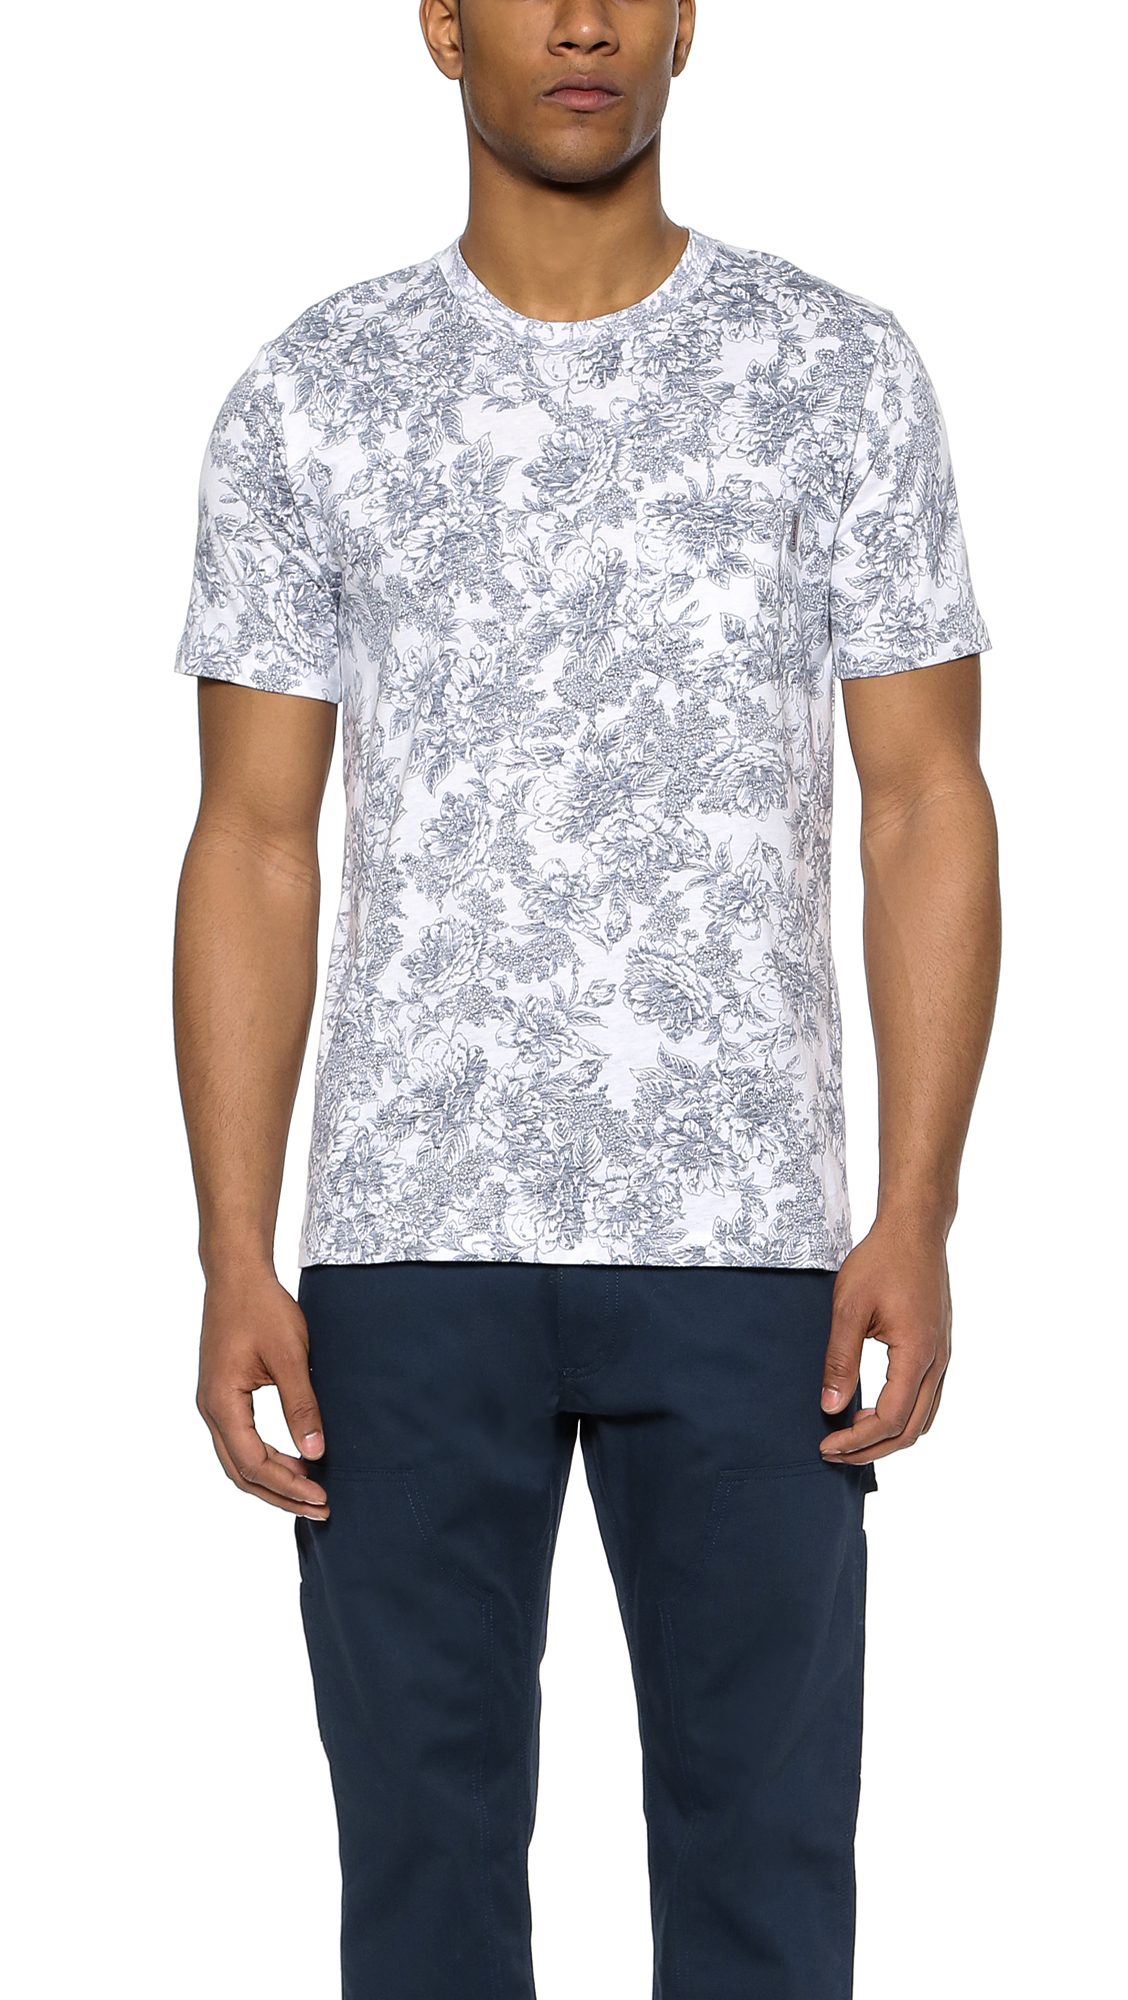 Carhartt WIP Wild Rose Pocket T-Shirt   Men's Prints